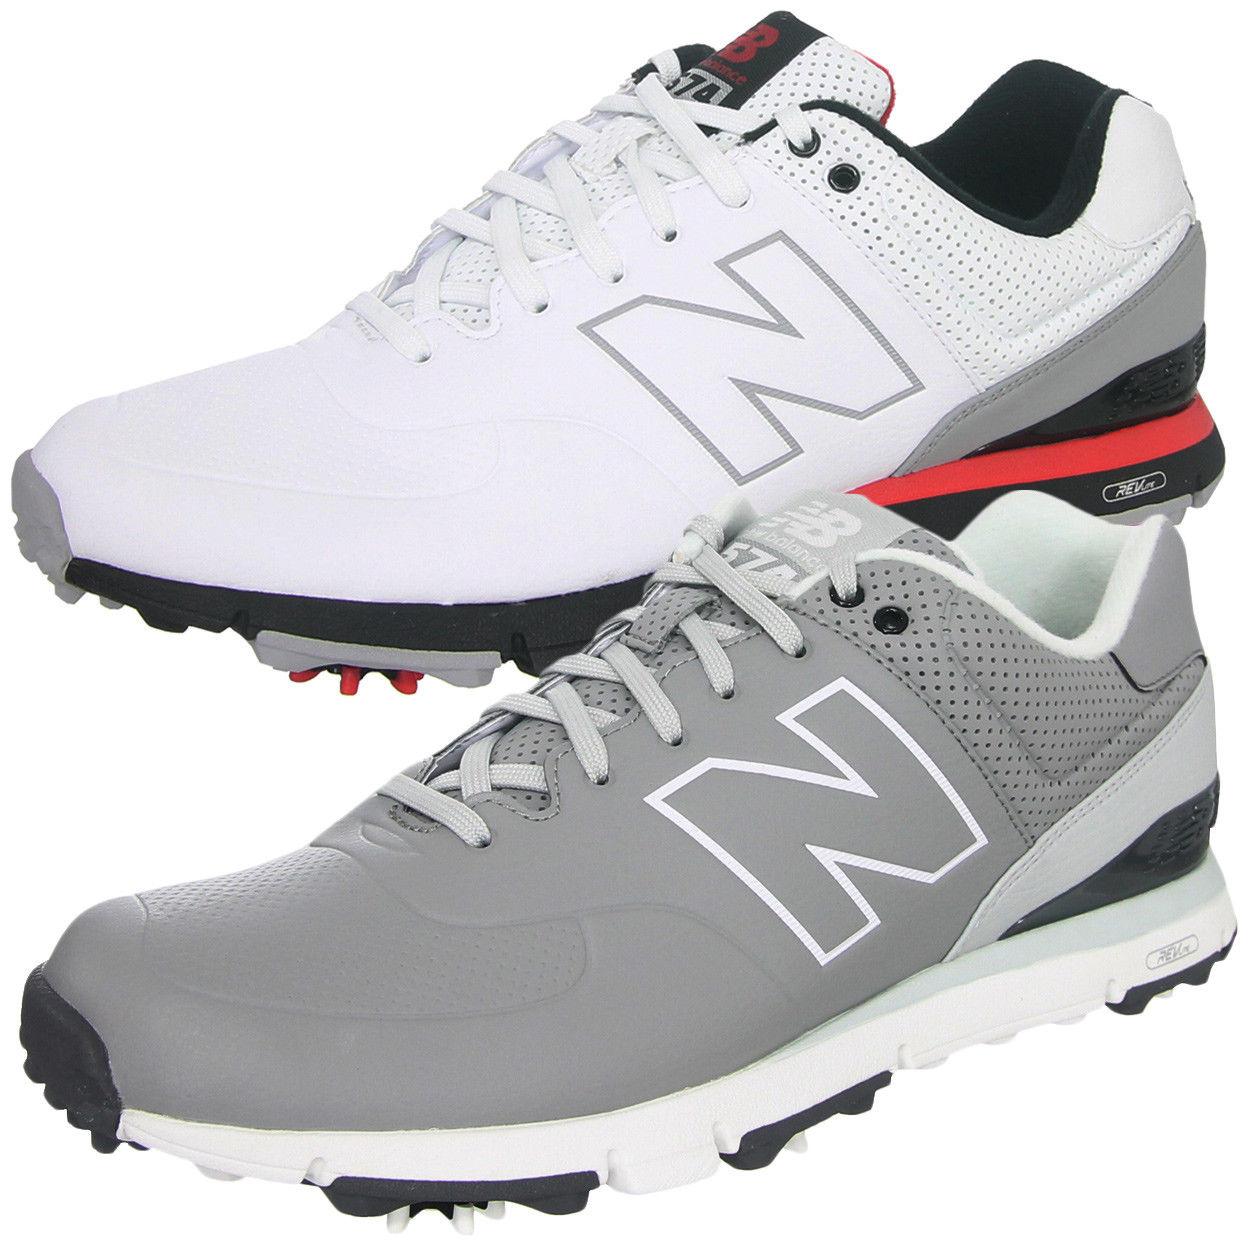 New Balance NBG574 Men's Microfiber Leather Golf Shoes Black/Grey/White  $52.99